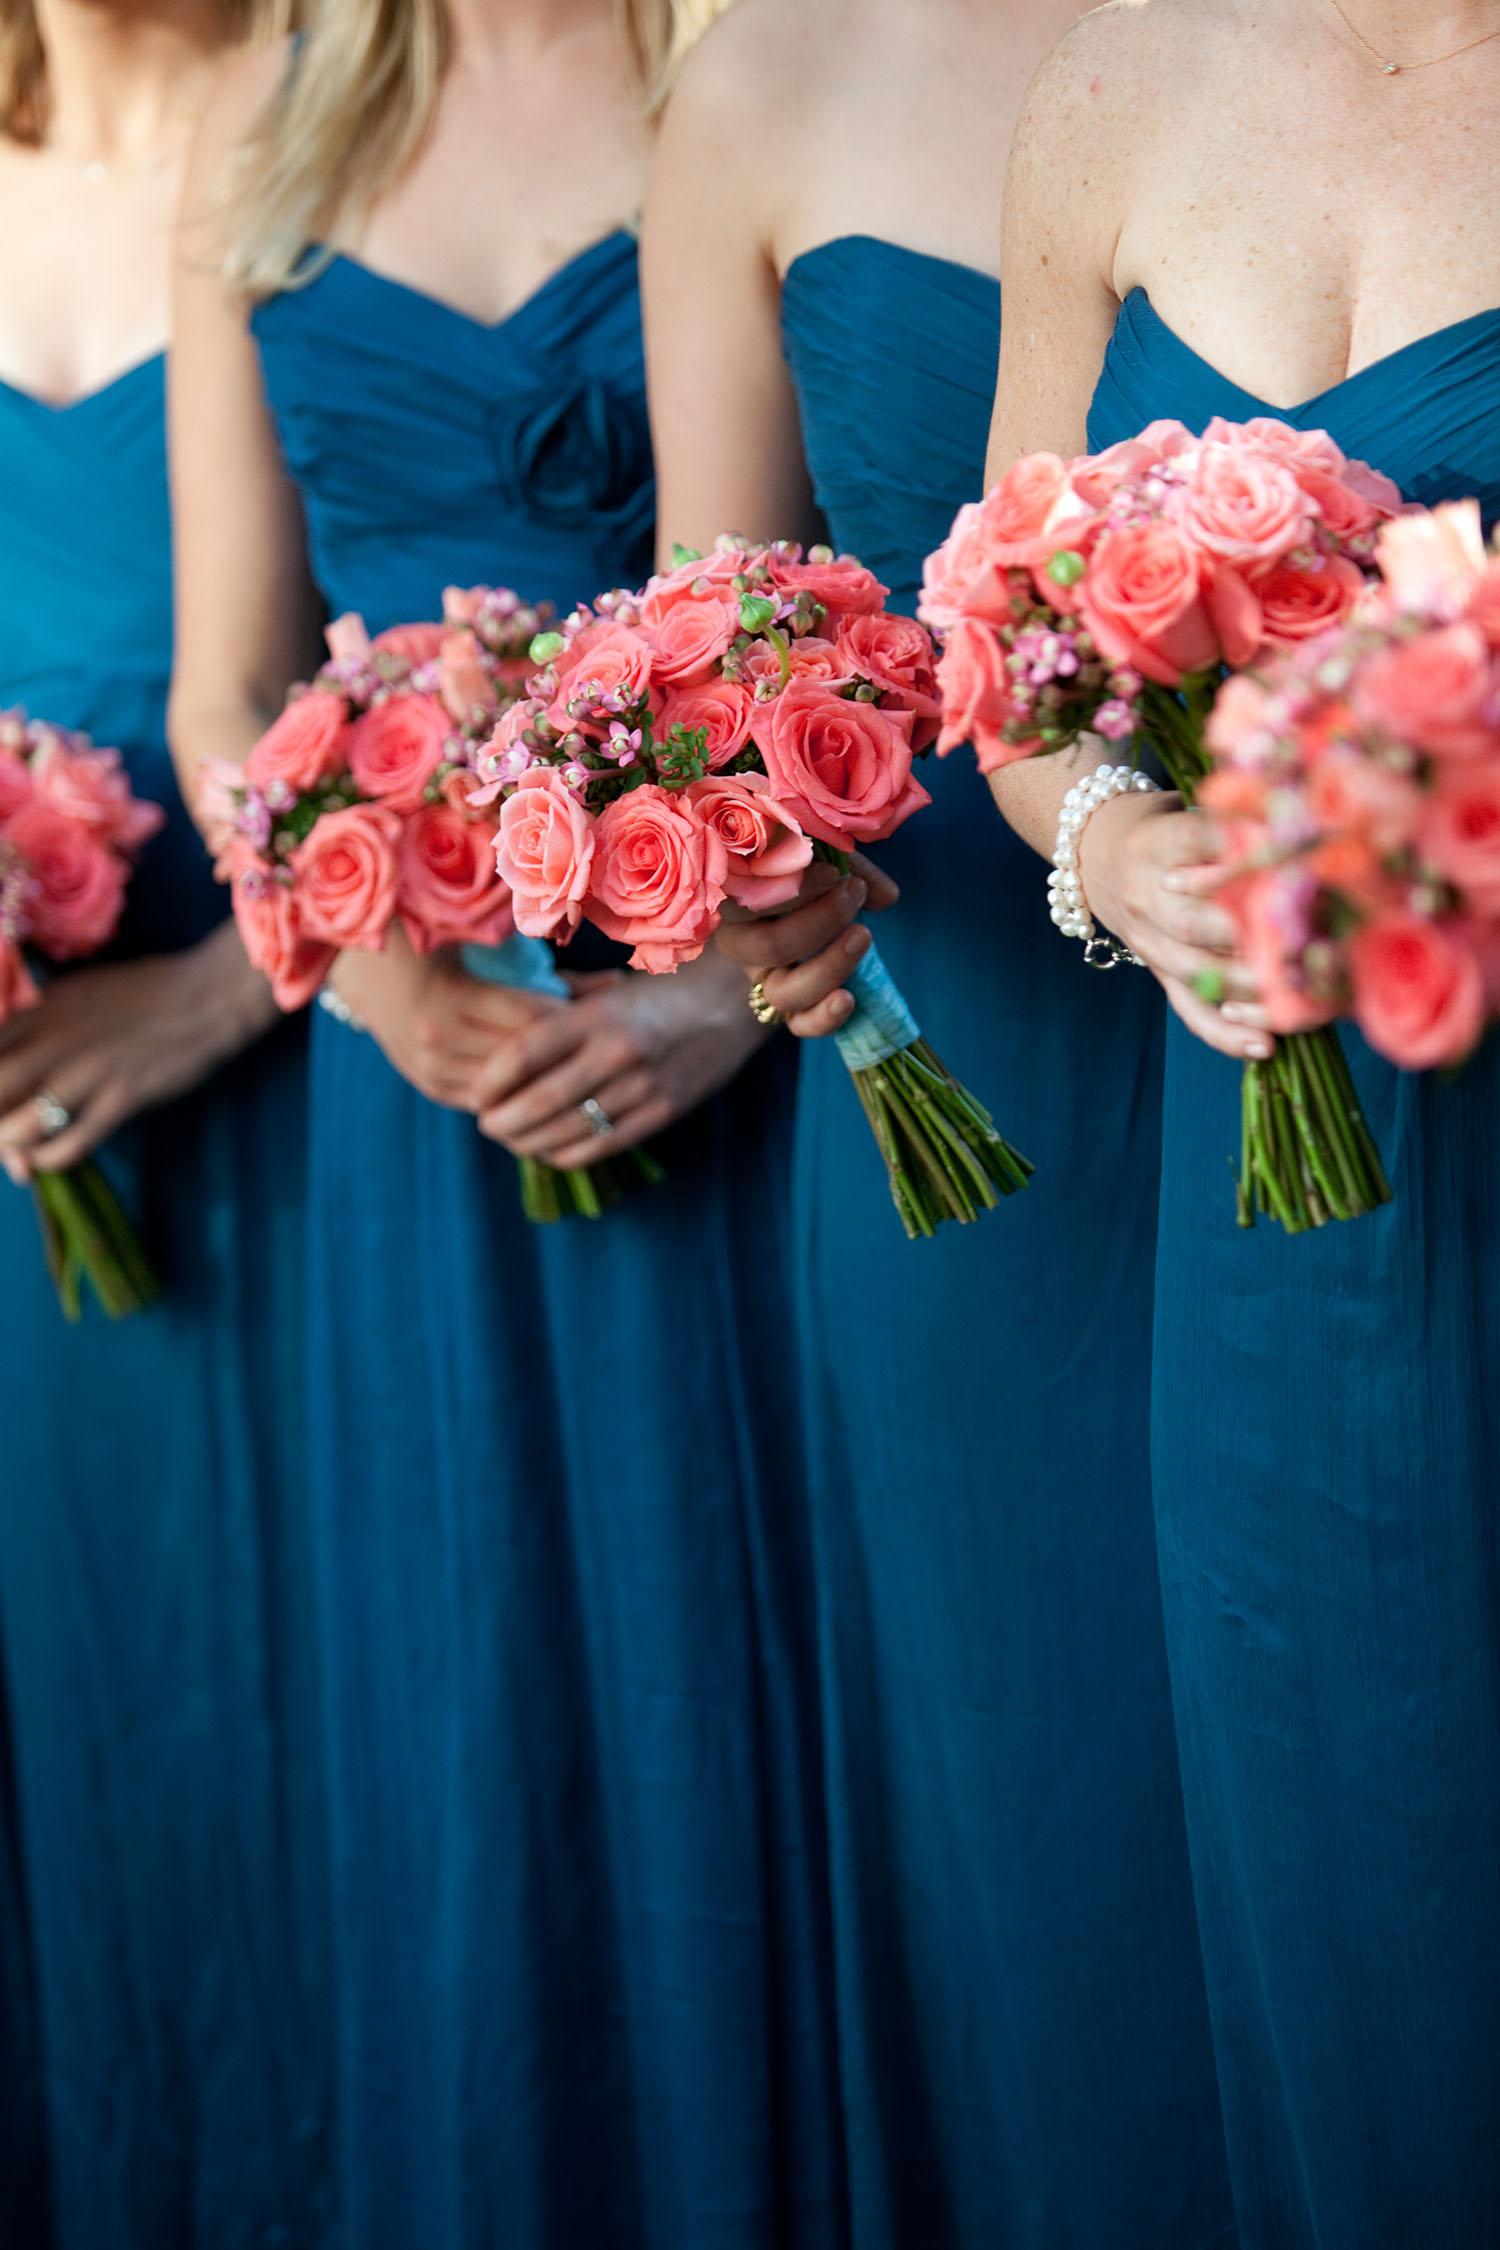 Sarah Miller Photography  | Wedding Reception | Four Seasons Hotel, Philadelphia, PA